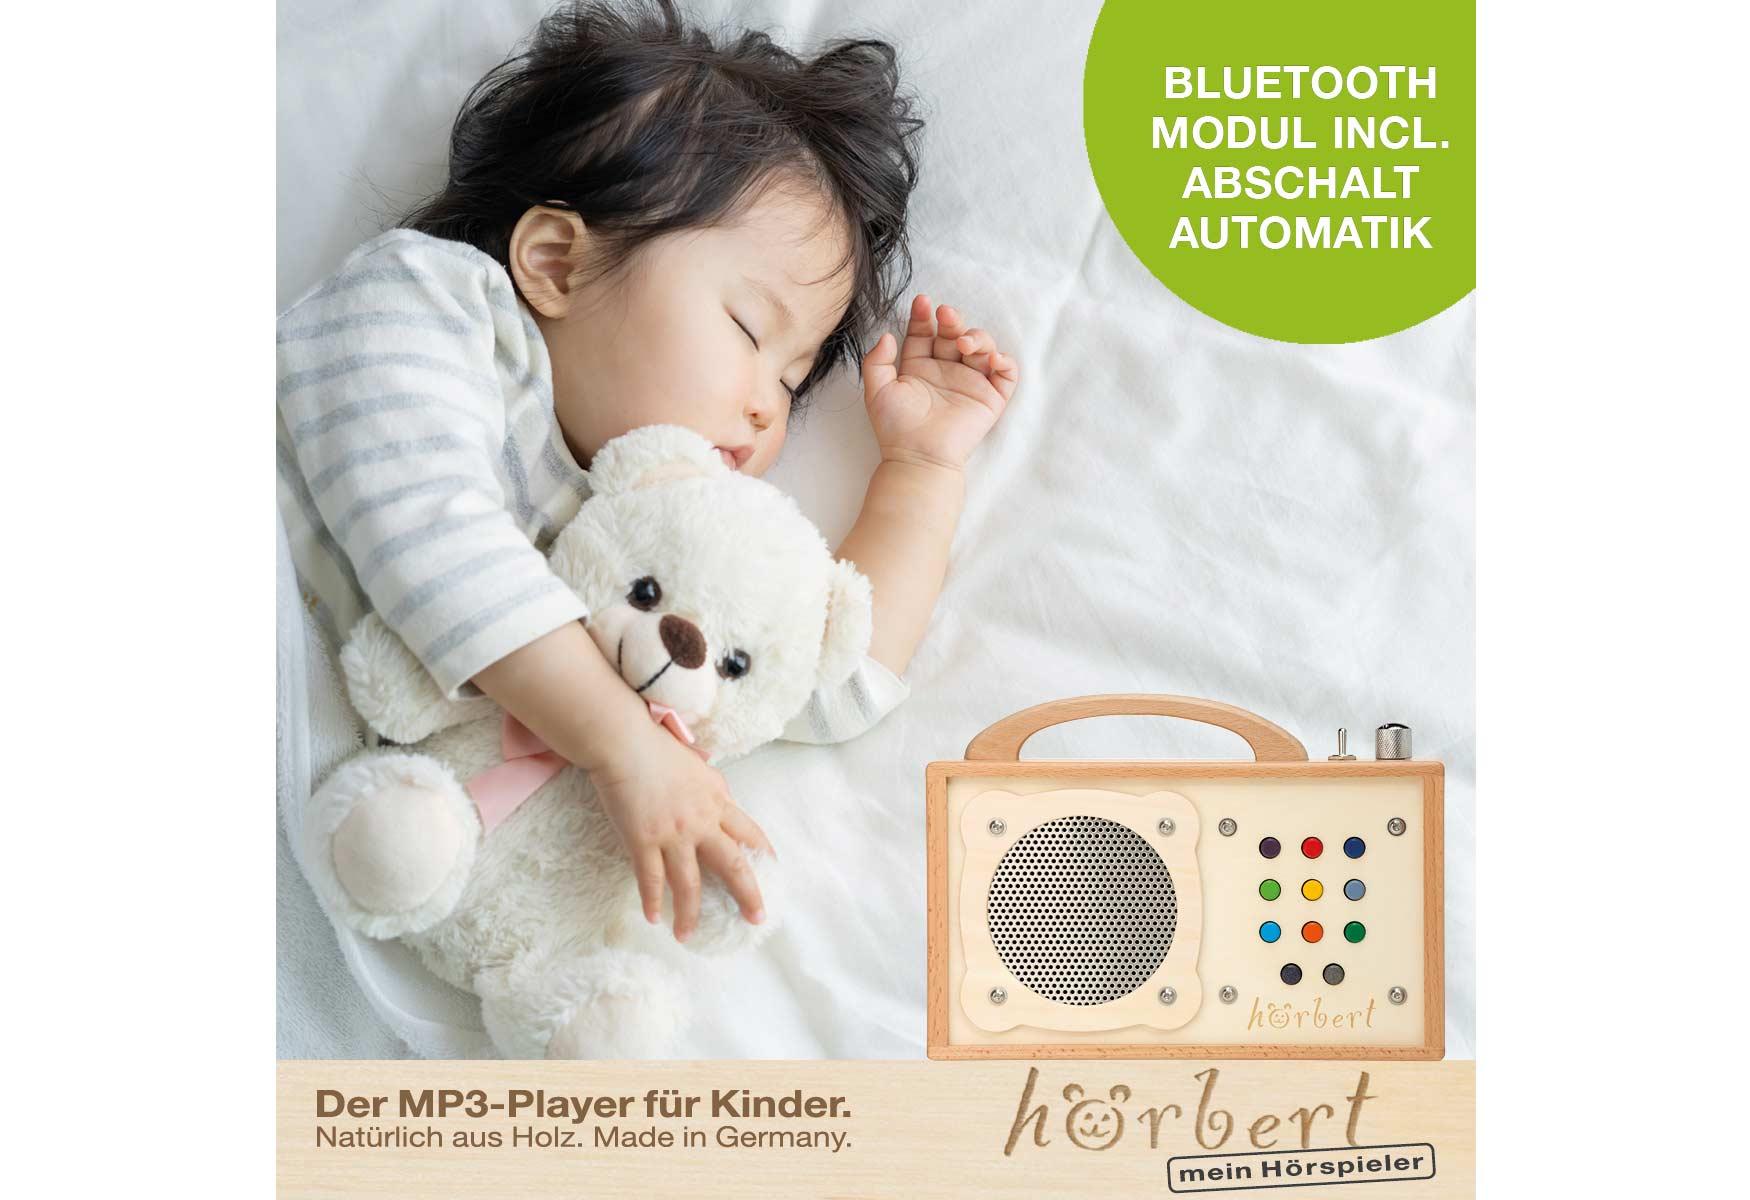 schlafendes Kind, Bluetooth hörbert